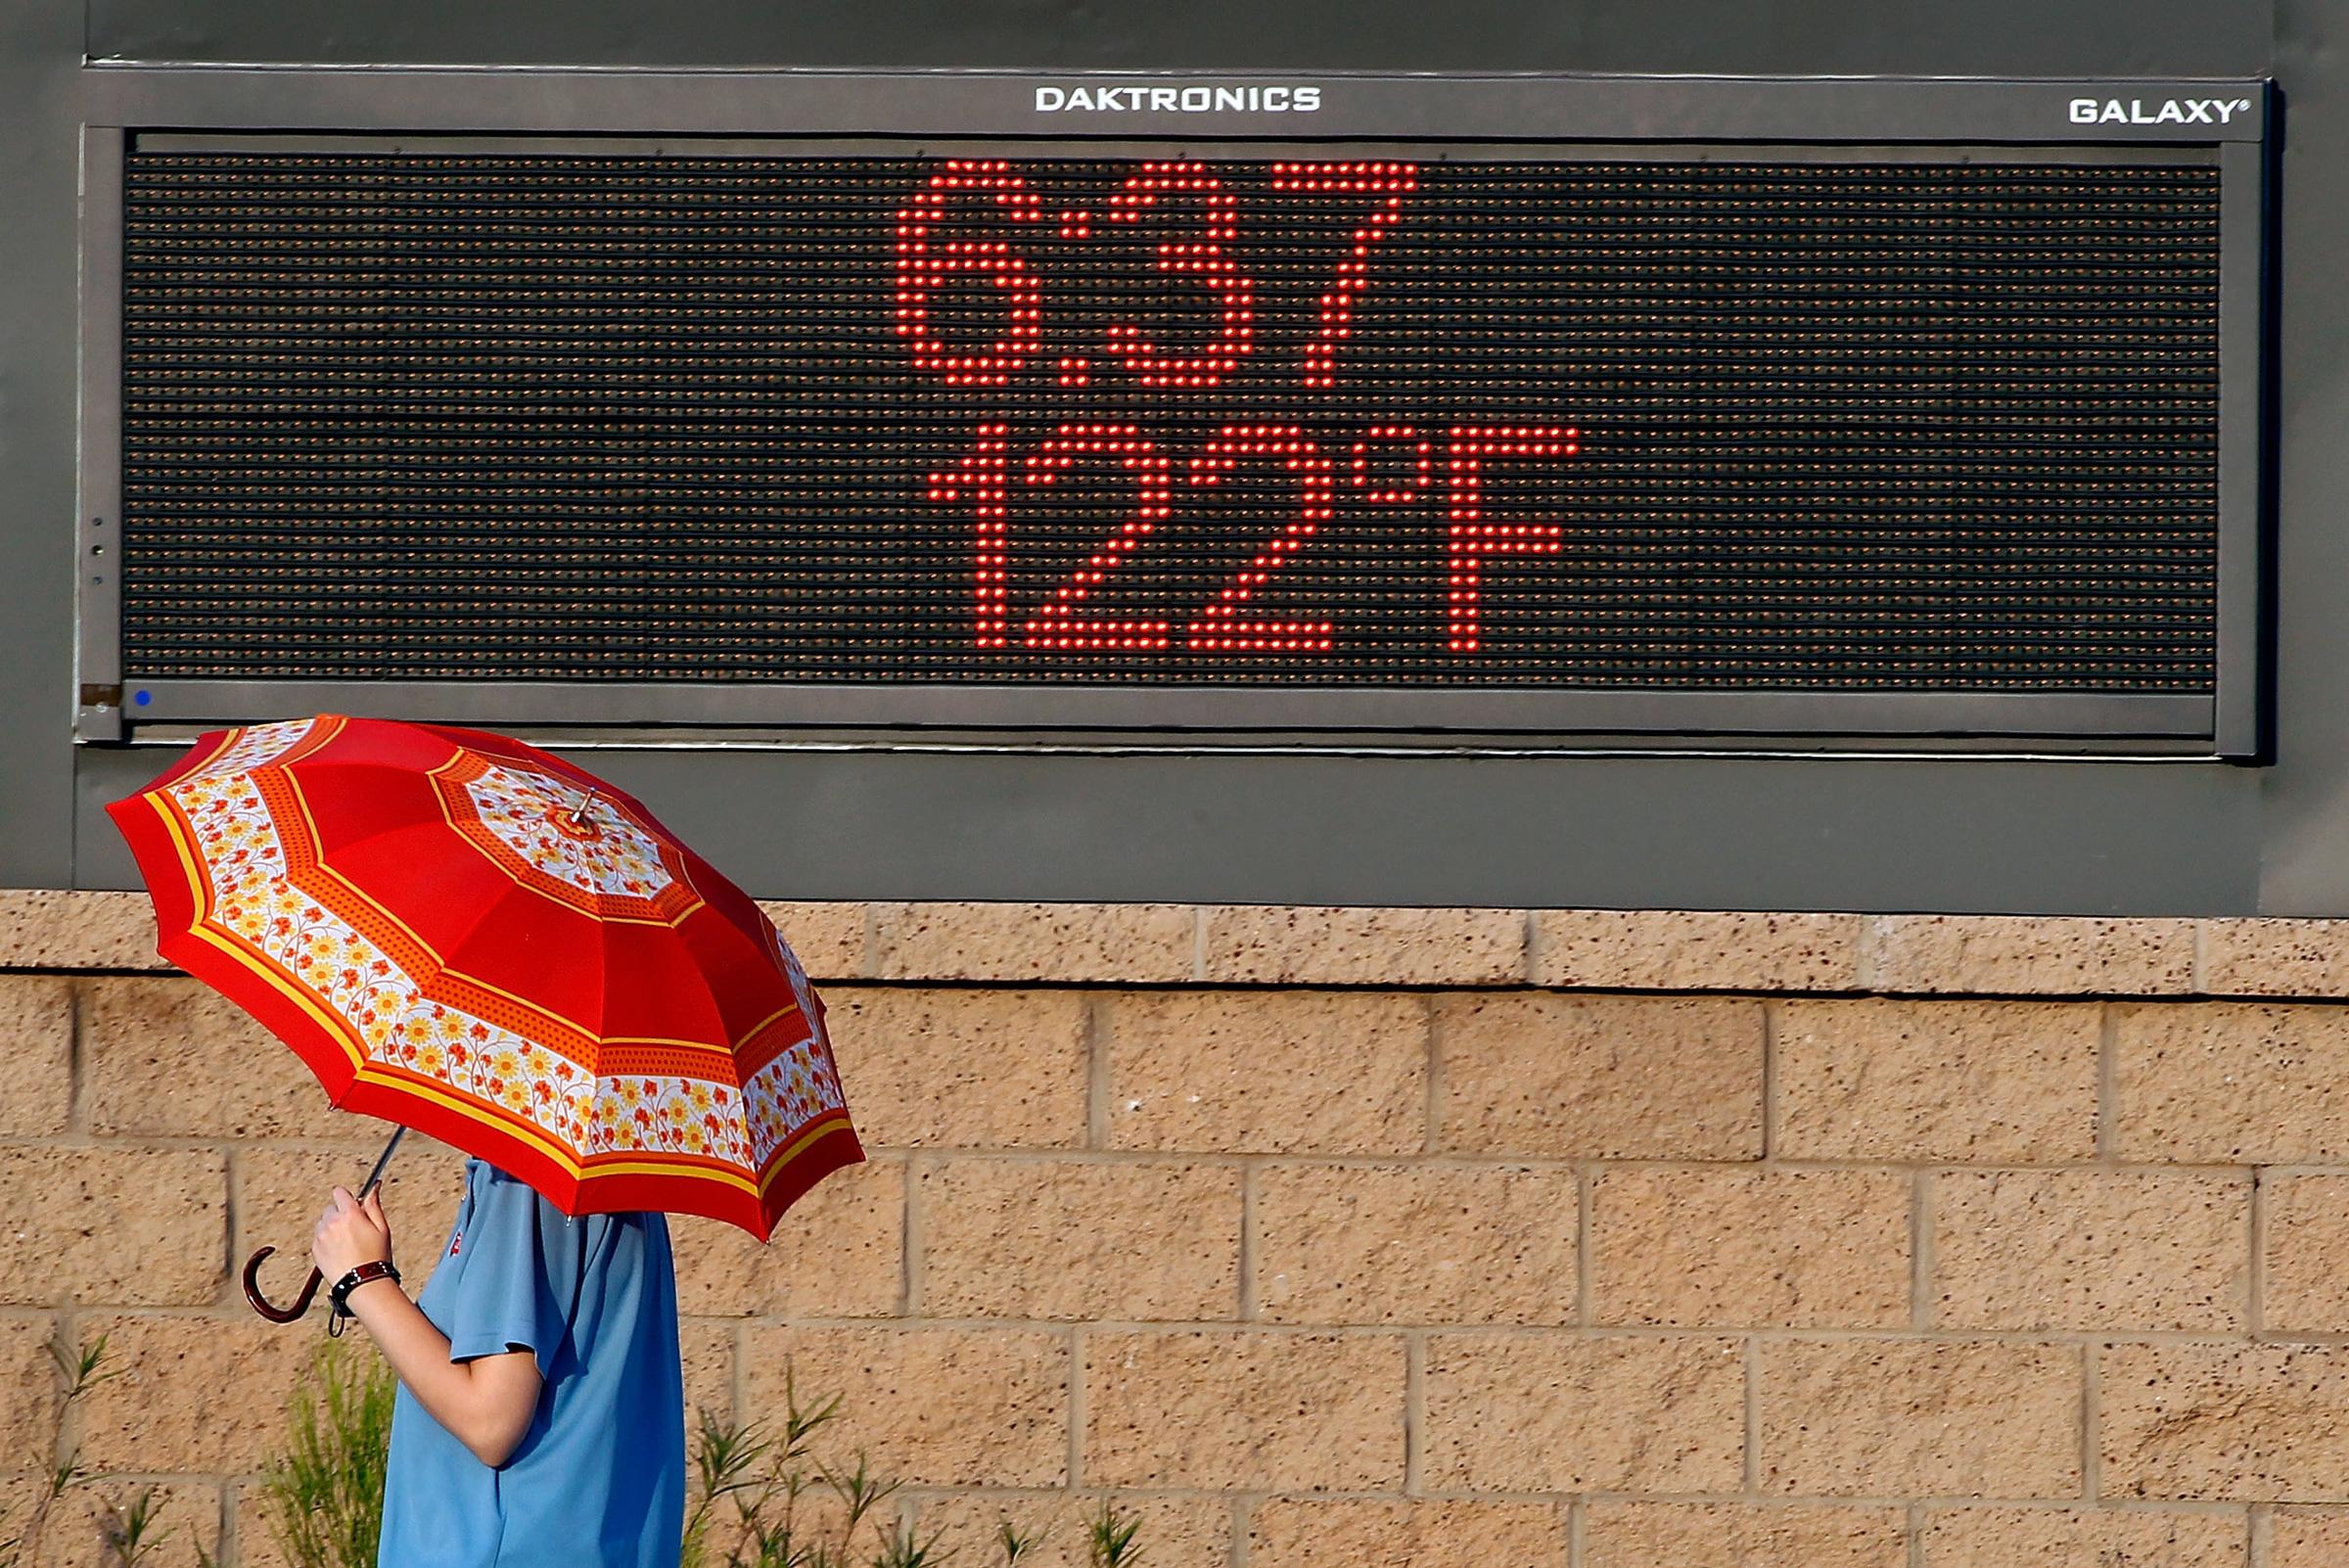 122-degrees-heatwave.jpg